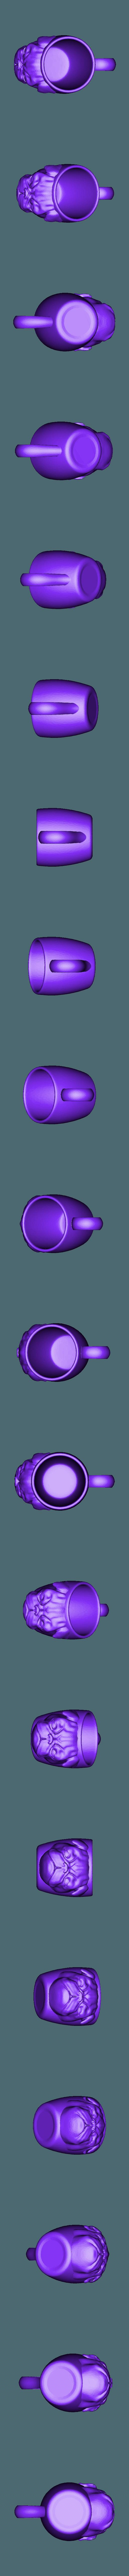 taza pug.stl Download free STL file Pug mug • 3D printer model, Marolce19